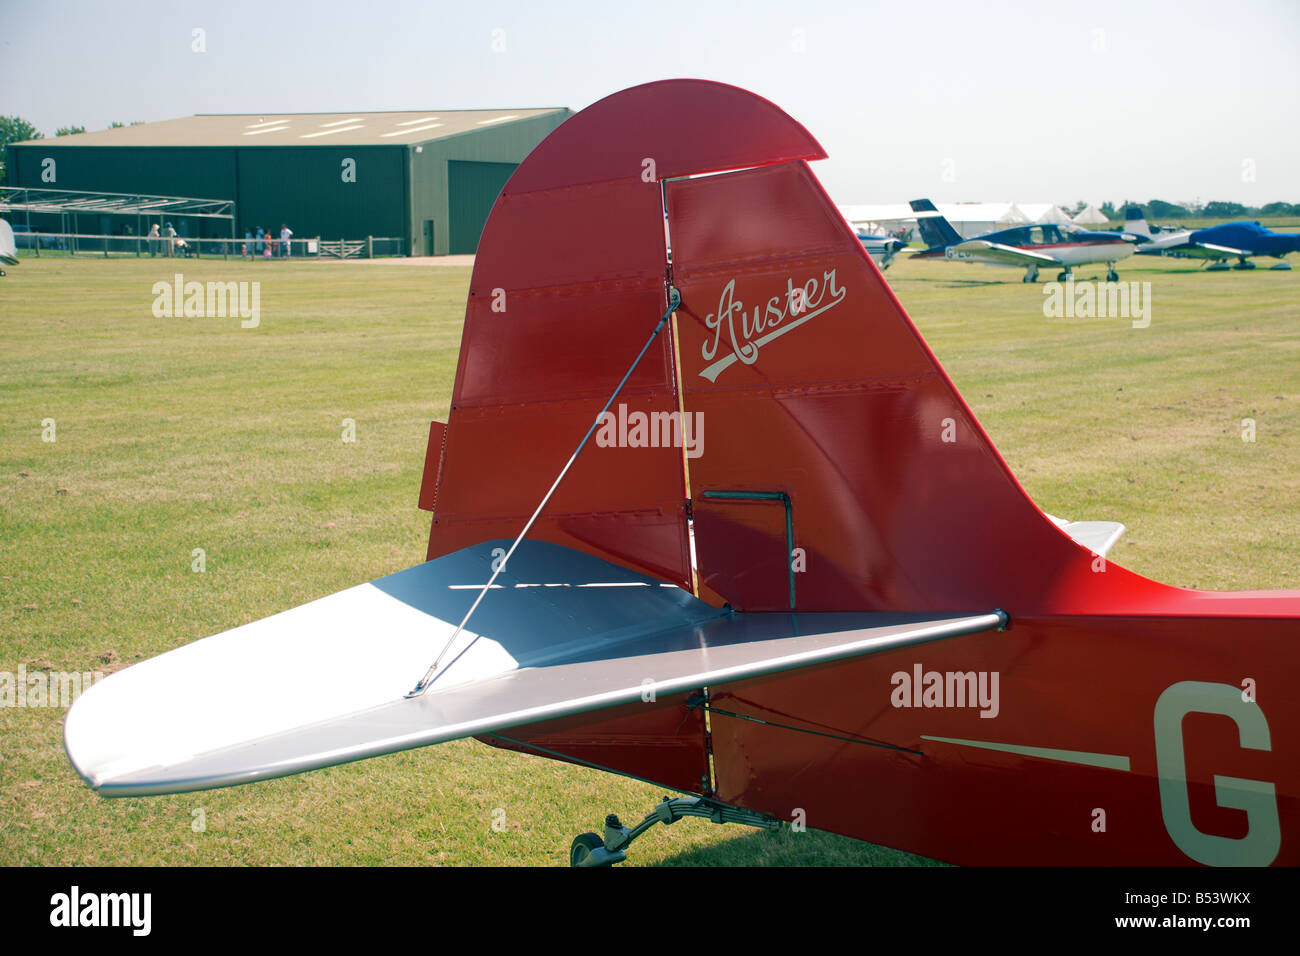 Auster light aeroplane - Stock Image